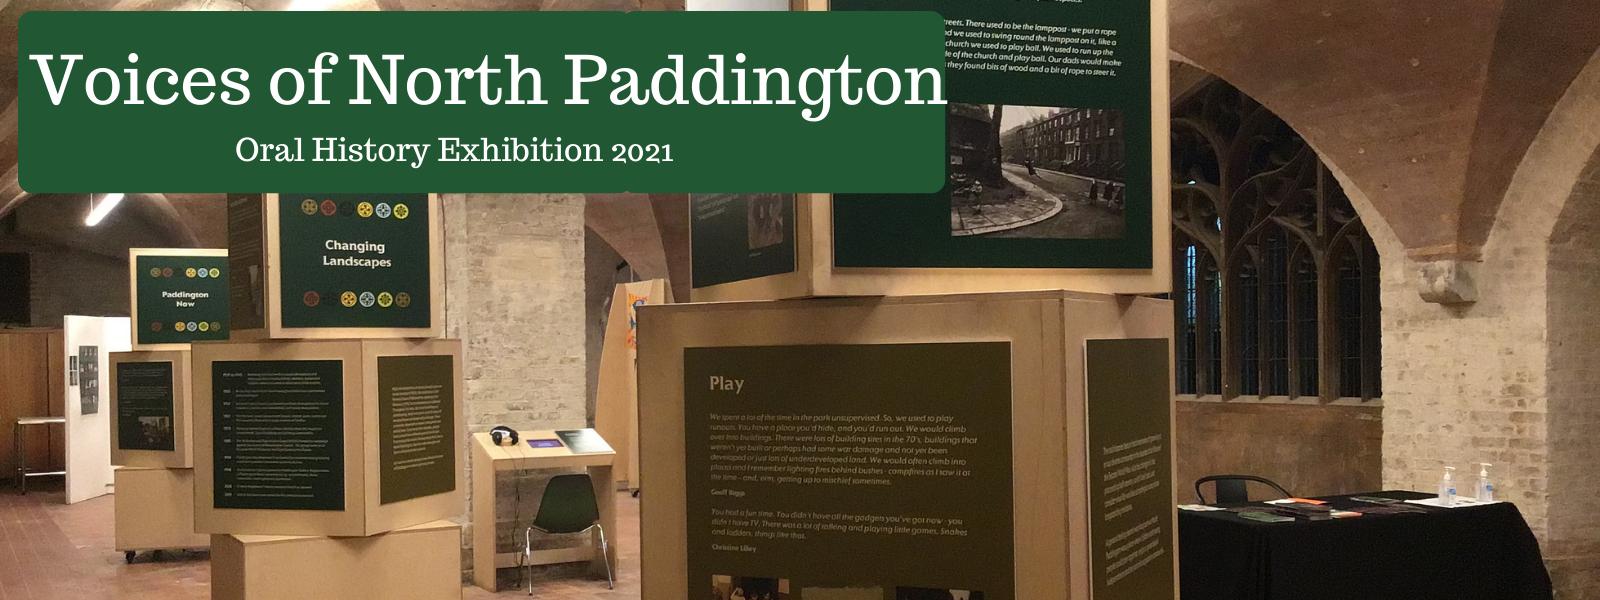 Voices of North Paddington Oral History Exhibition 2021